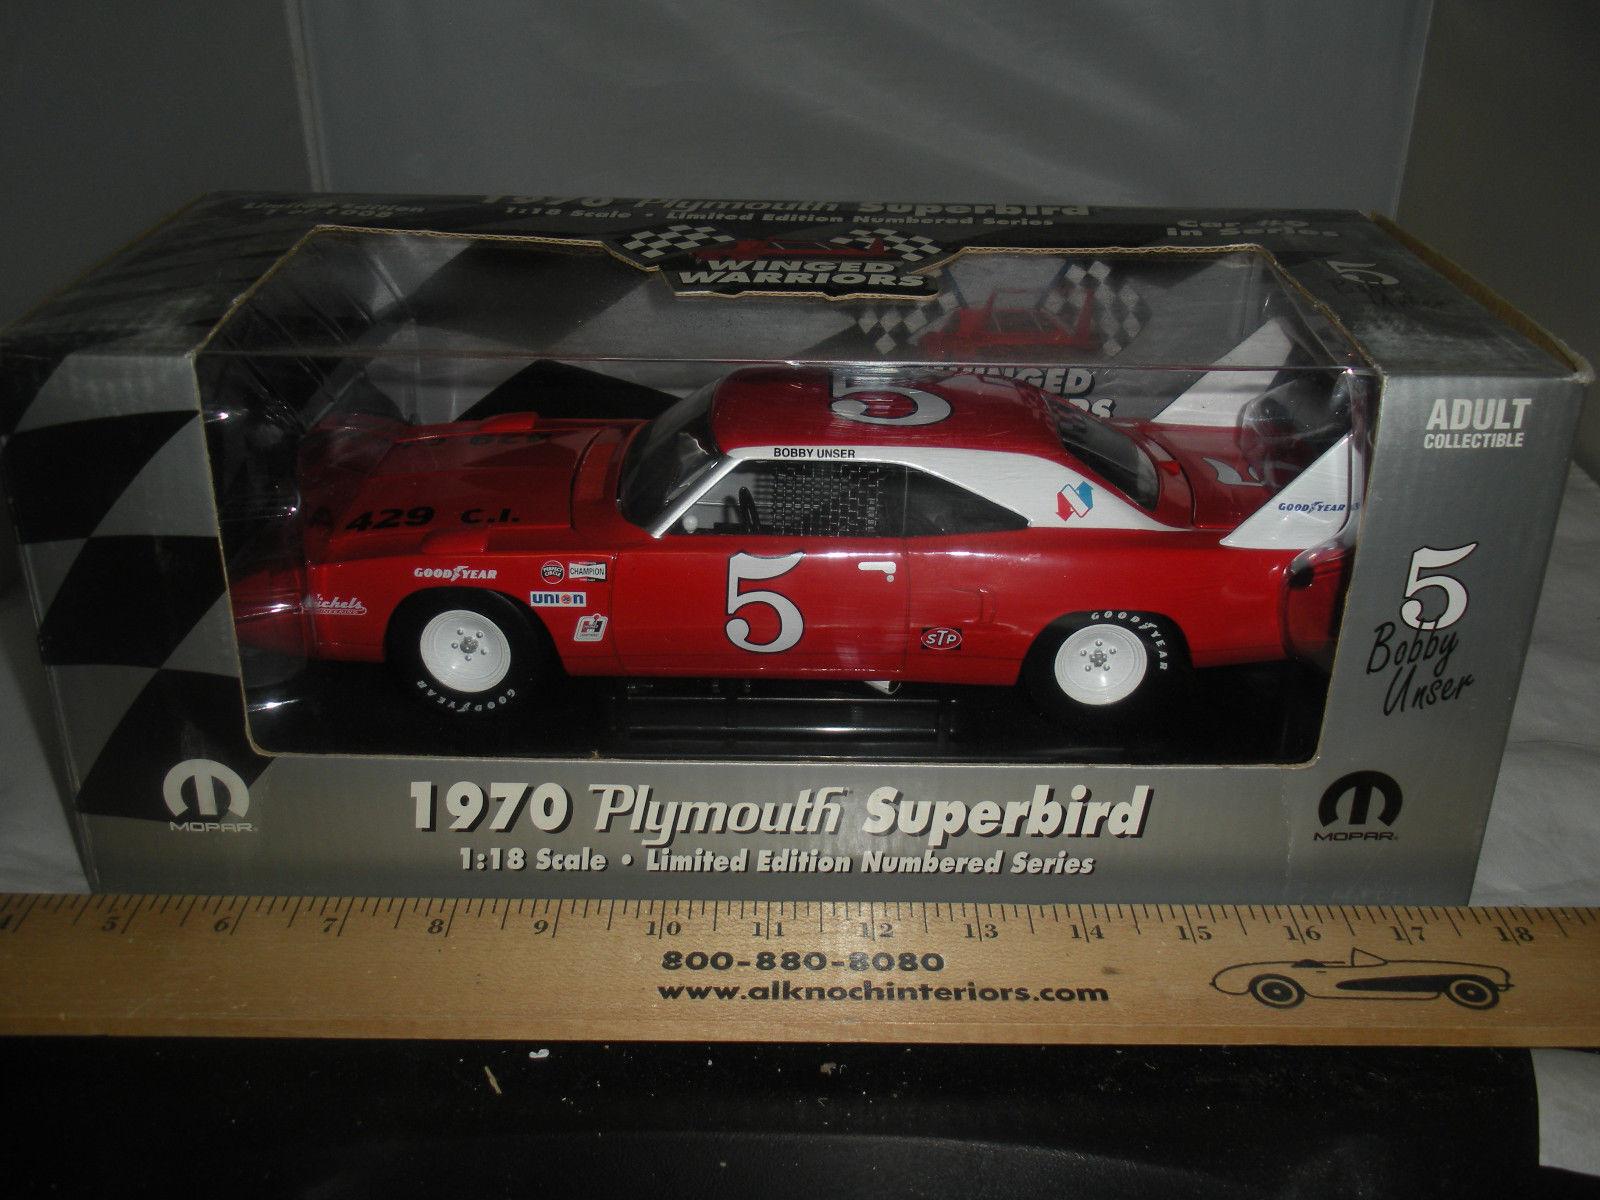 ecco l'ultimo 1 18 ERTL 1970 Plymouth Superbird  5 5 5 Bobby il nostro Winged Warriors rosso & bianca  5  negozio outlet